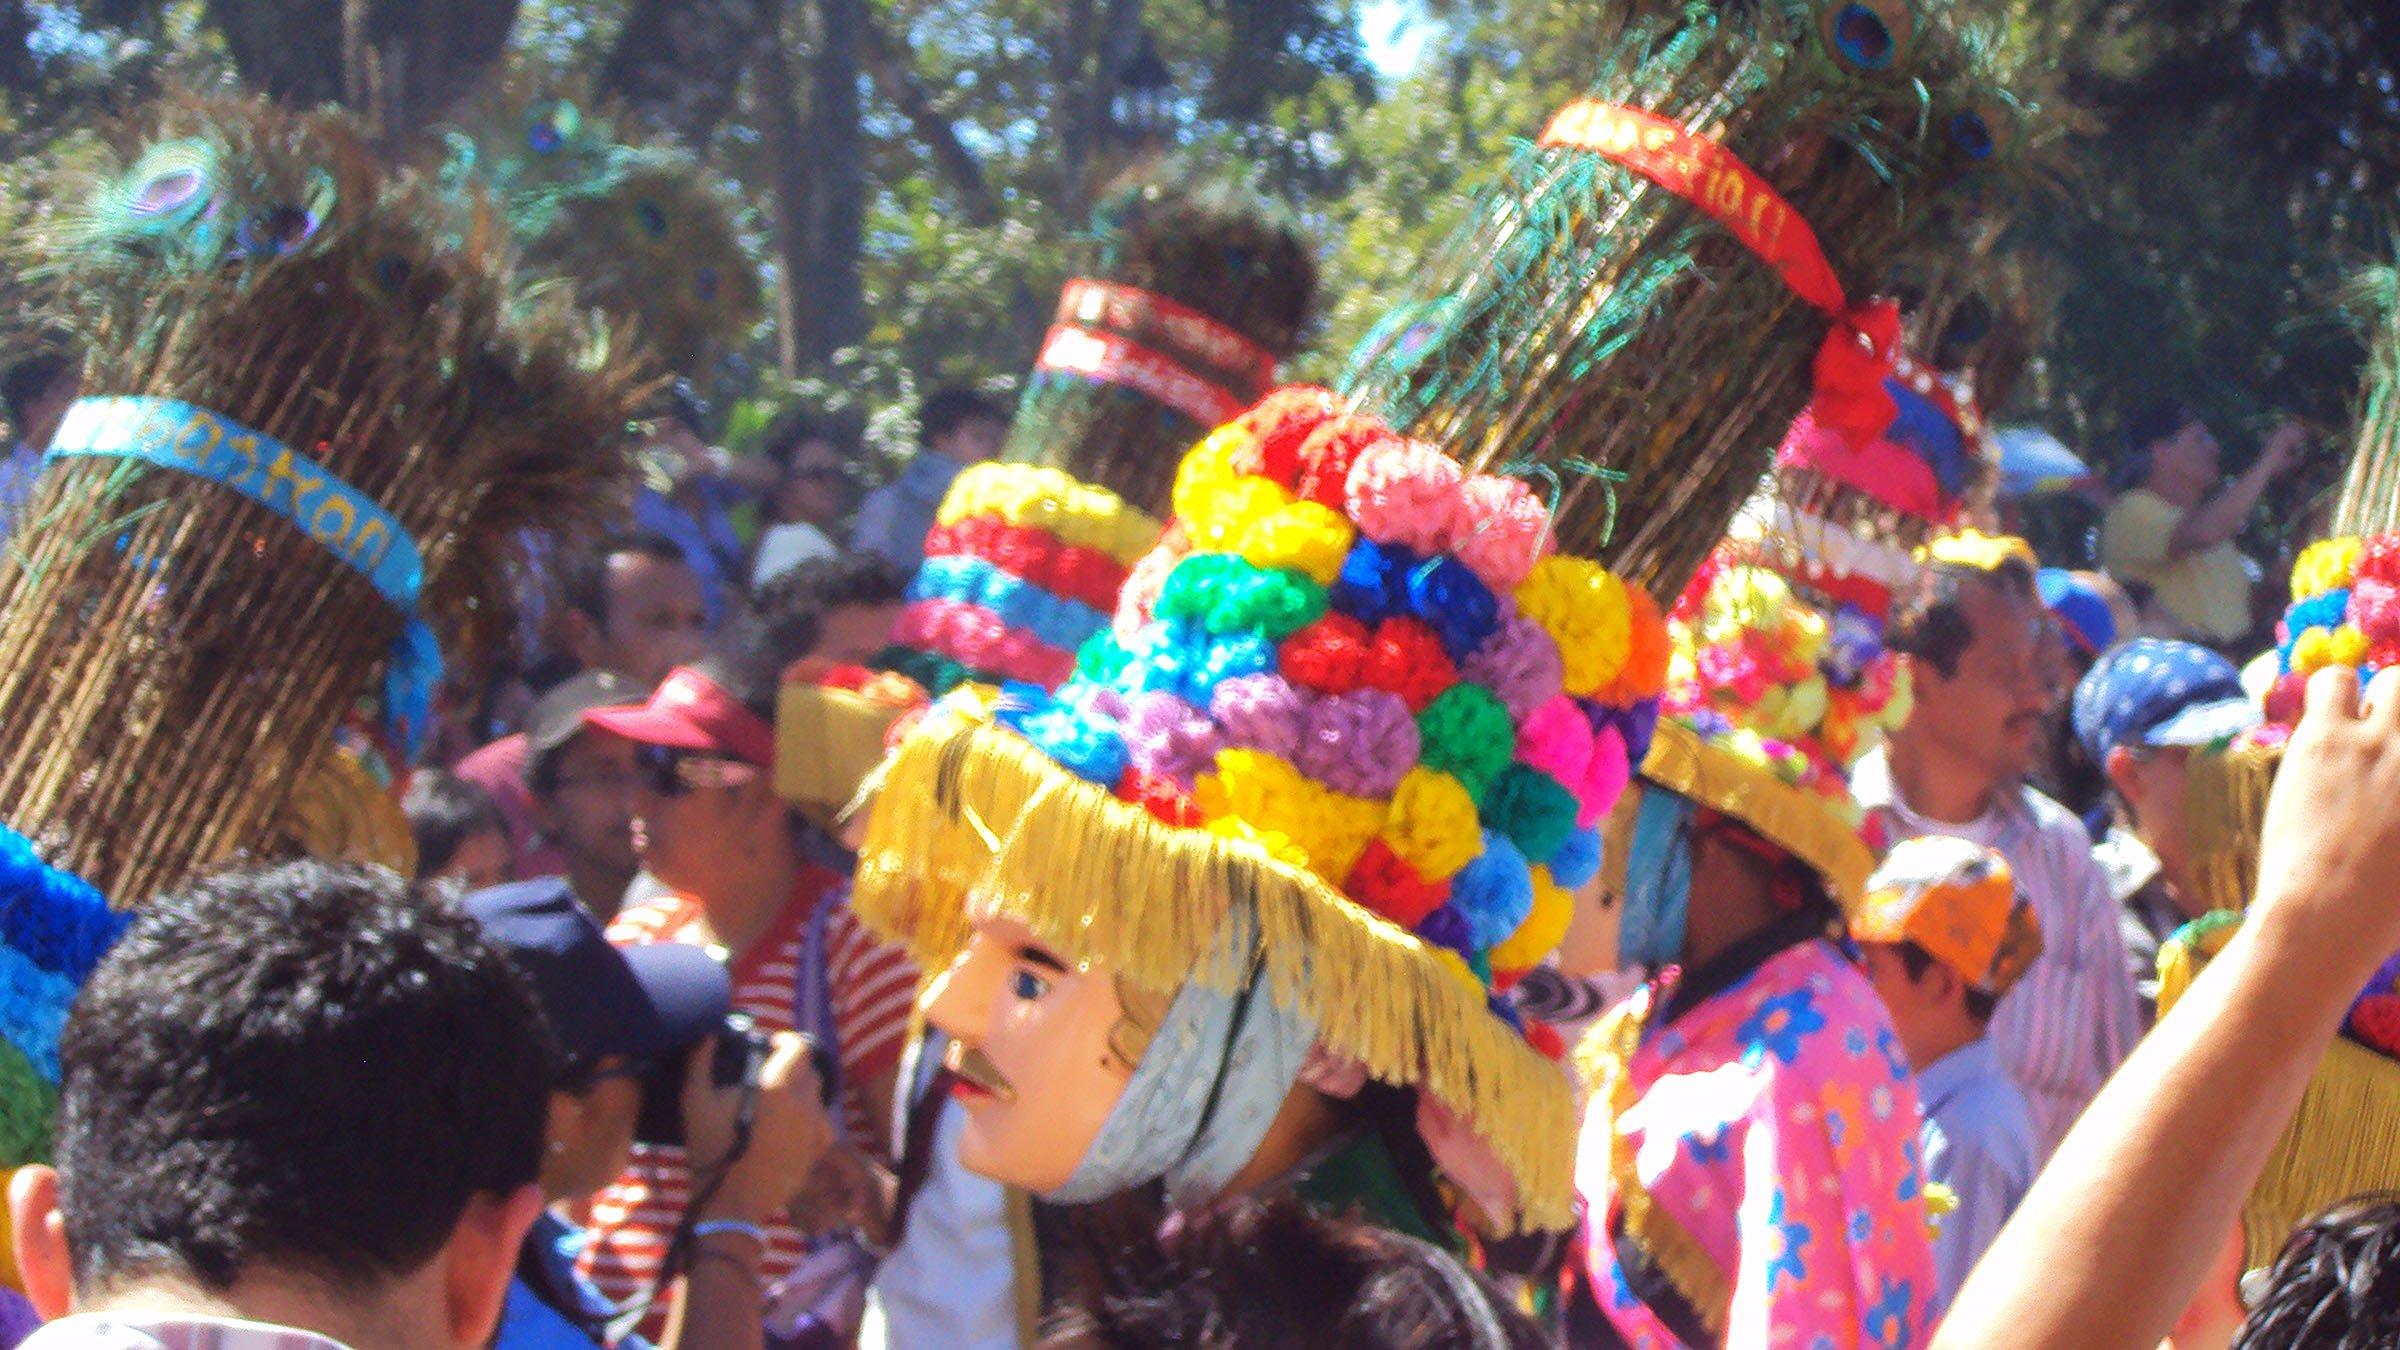 El Gegense una comedia tpica de Carazo en Nicaragua